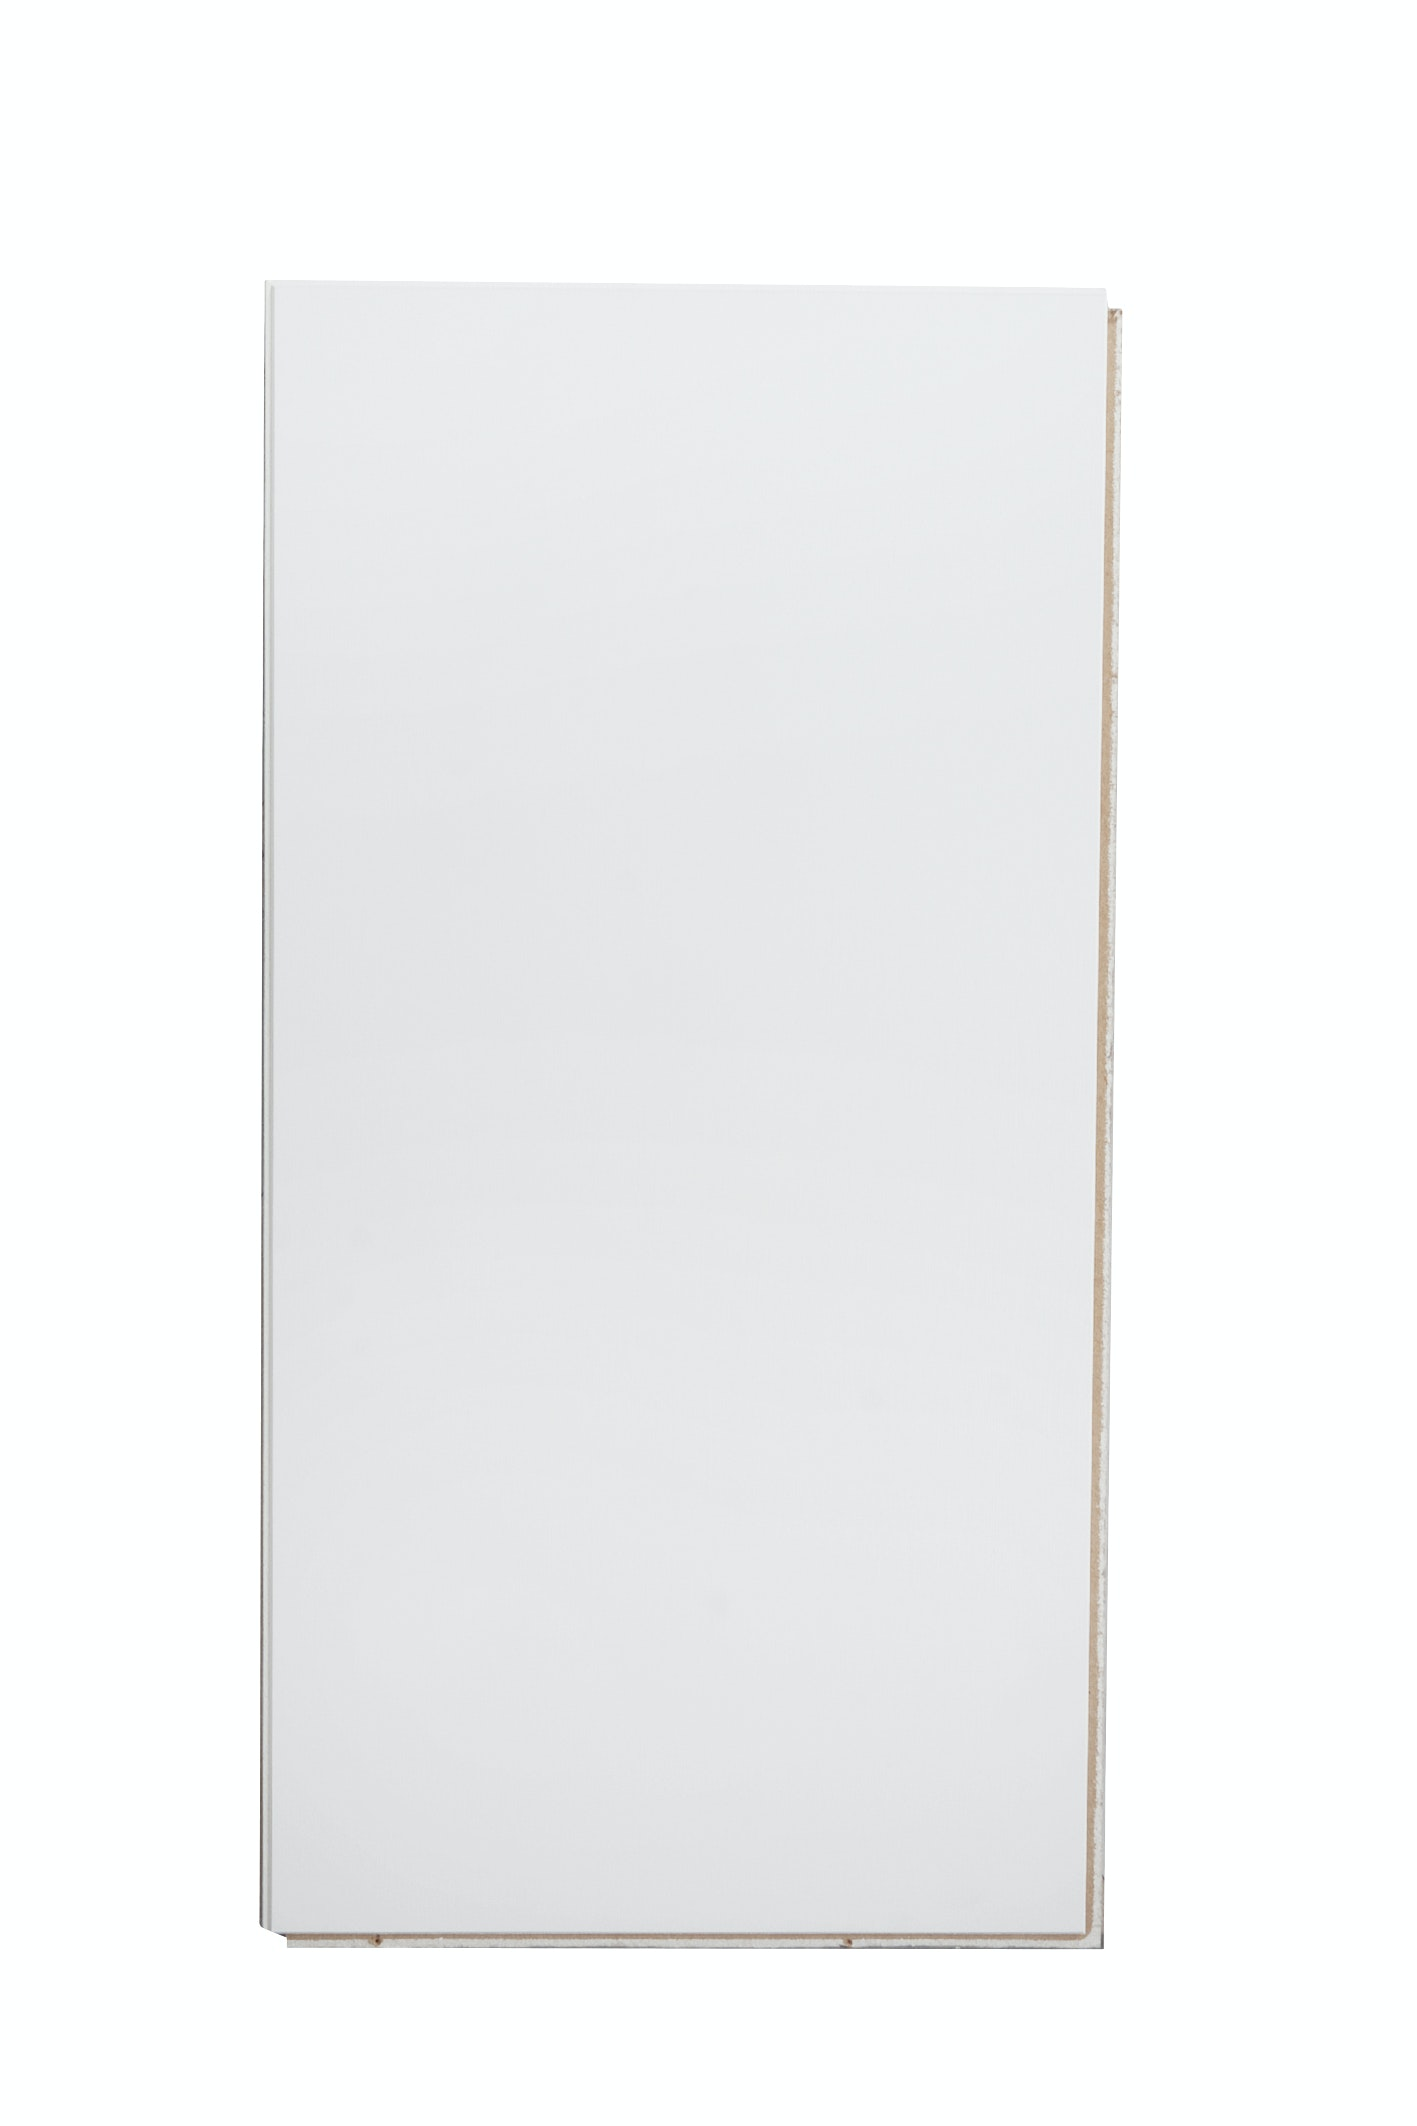 Takskiva Huntonit Brilliant Vit 300x1220mm 1,34m2/paket